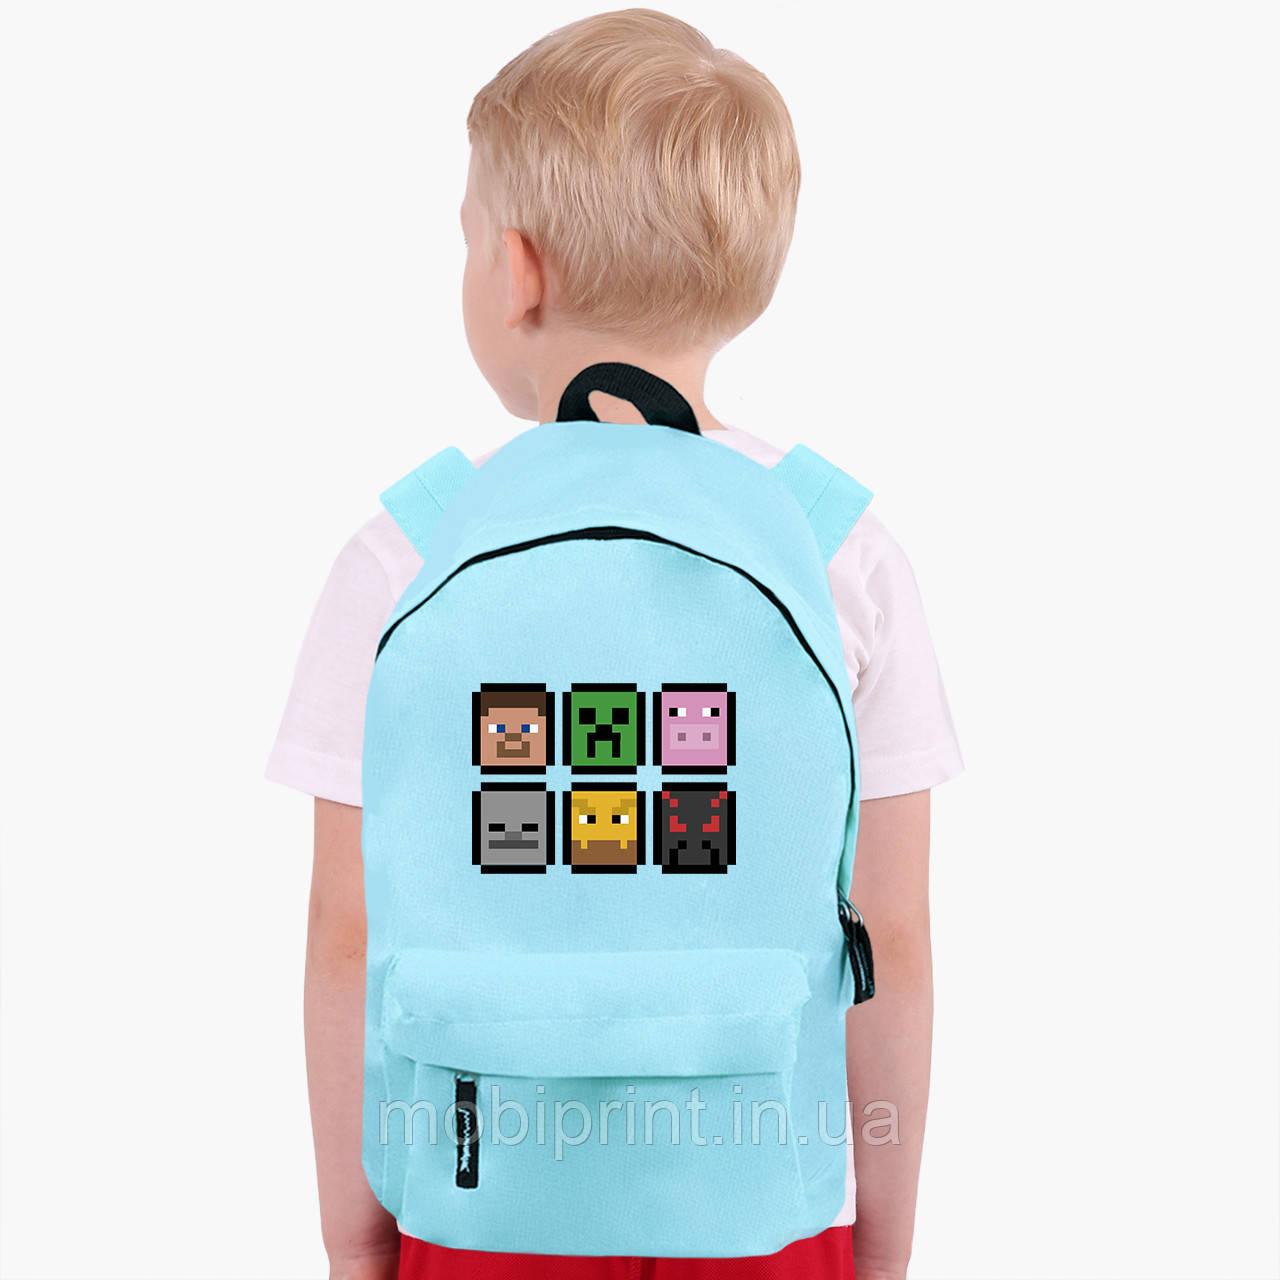 Детский рюкзак Майнкрафт (Minecraft) (9263-1173)